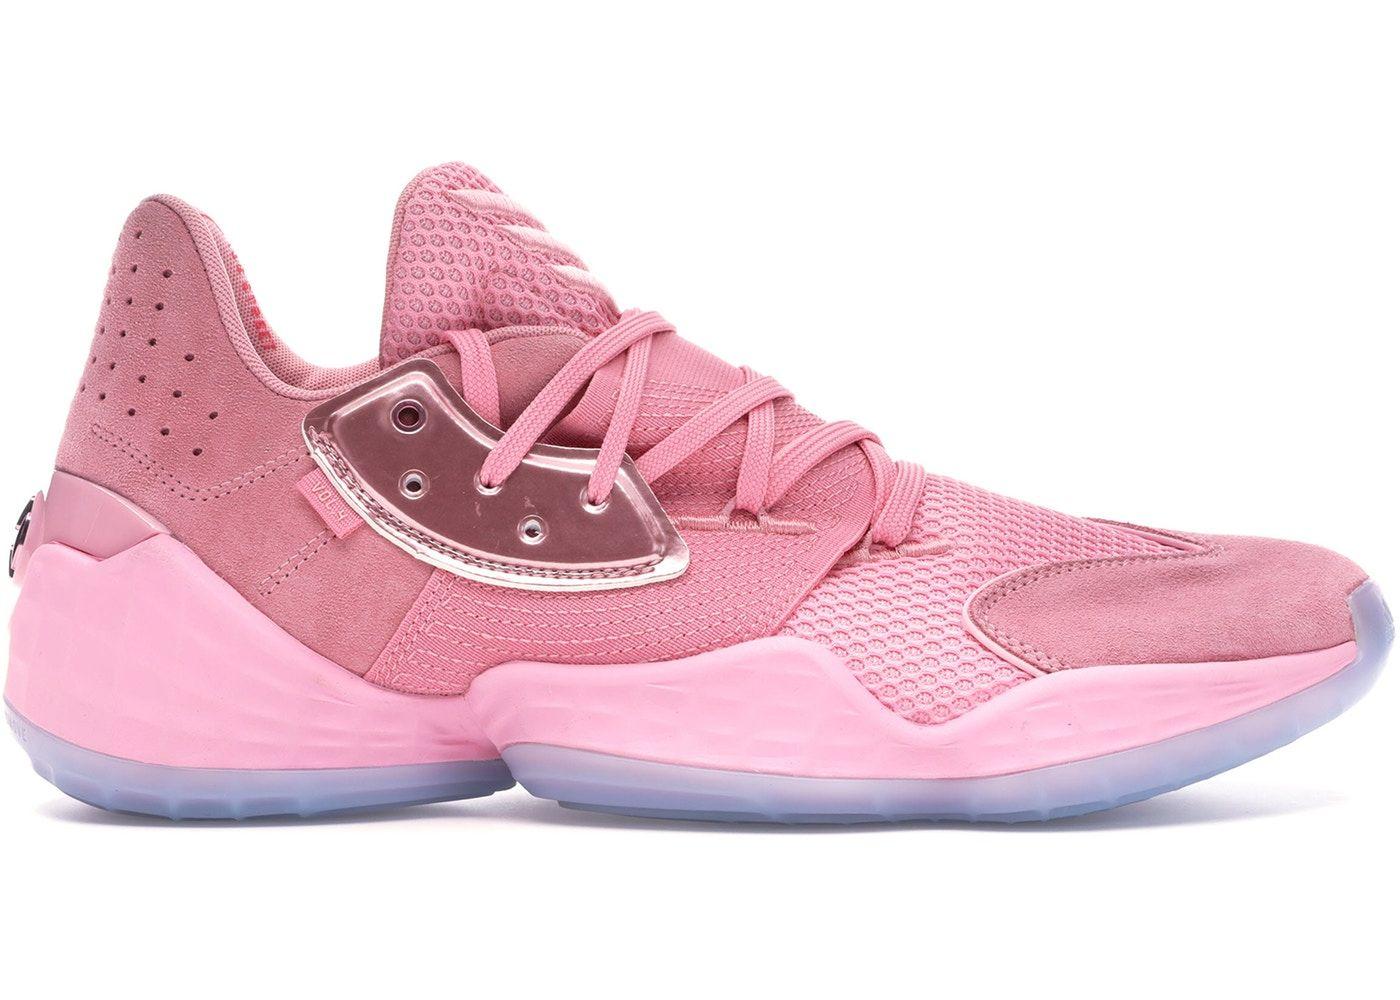 adidas Harden Vol. 4 Pink Lemonade in